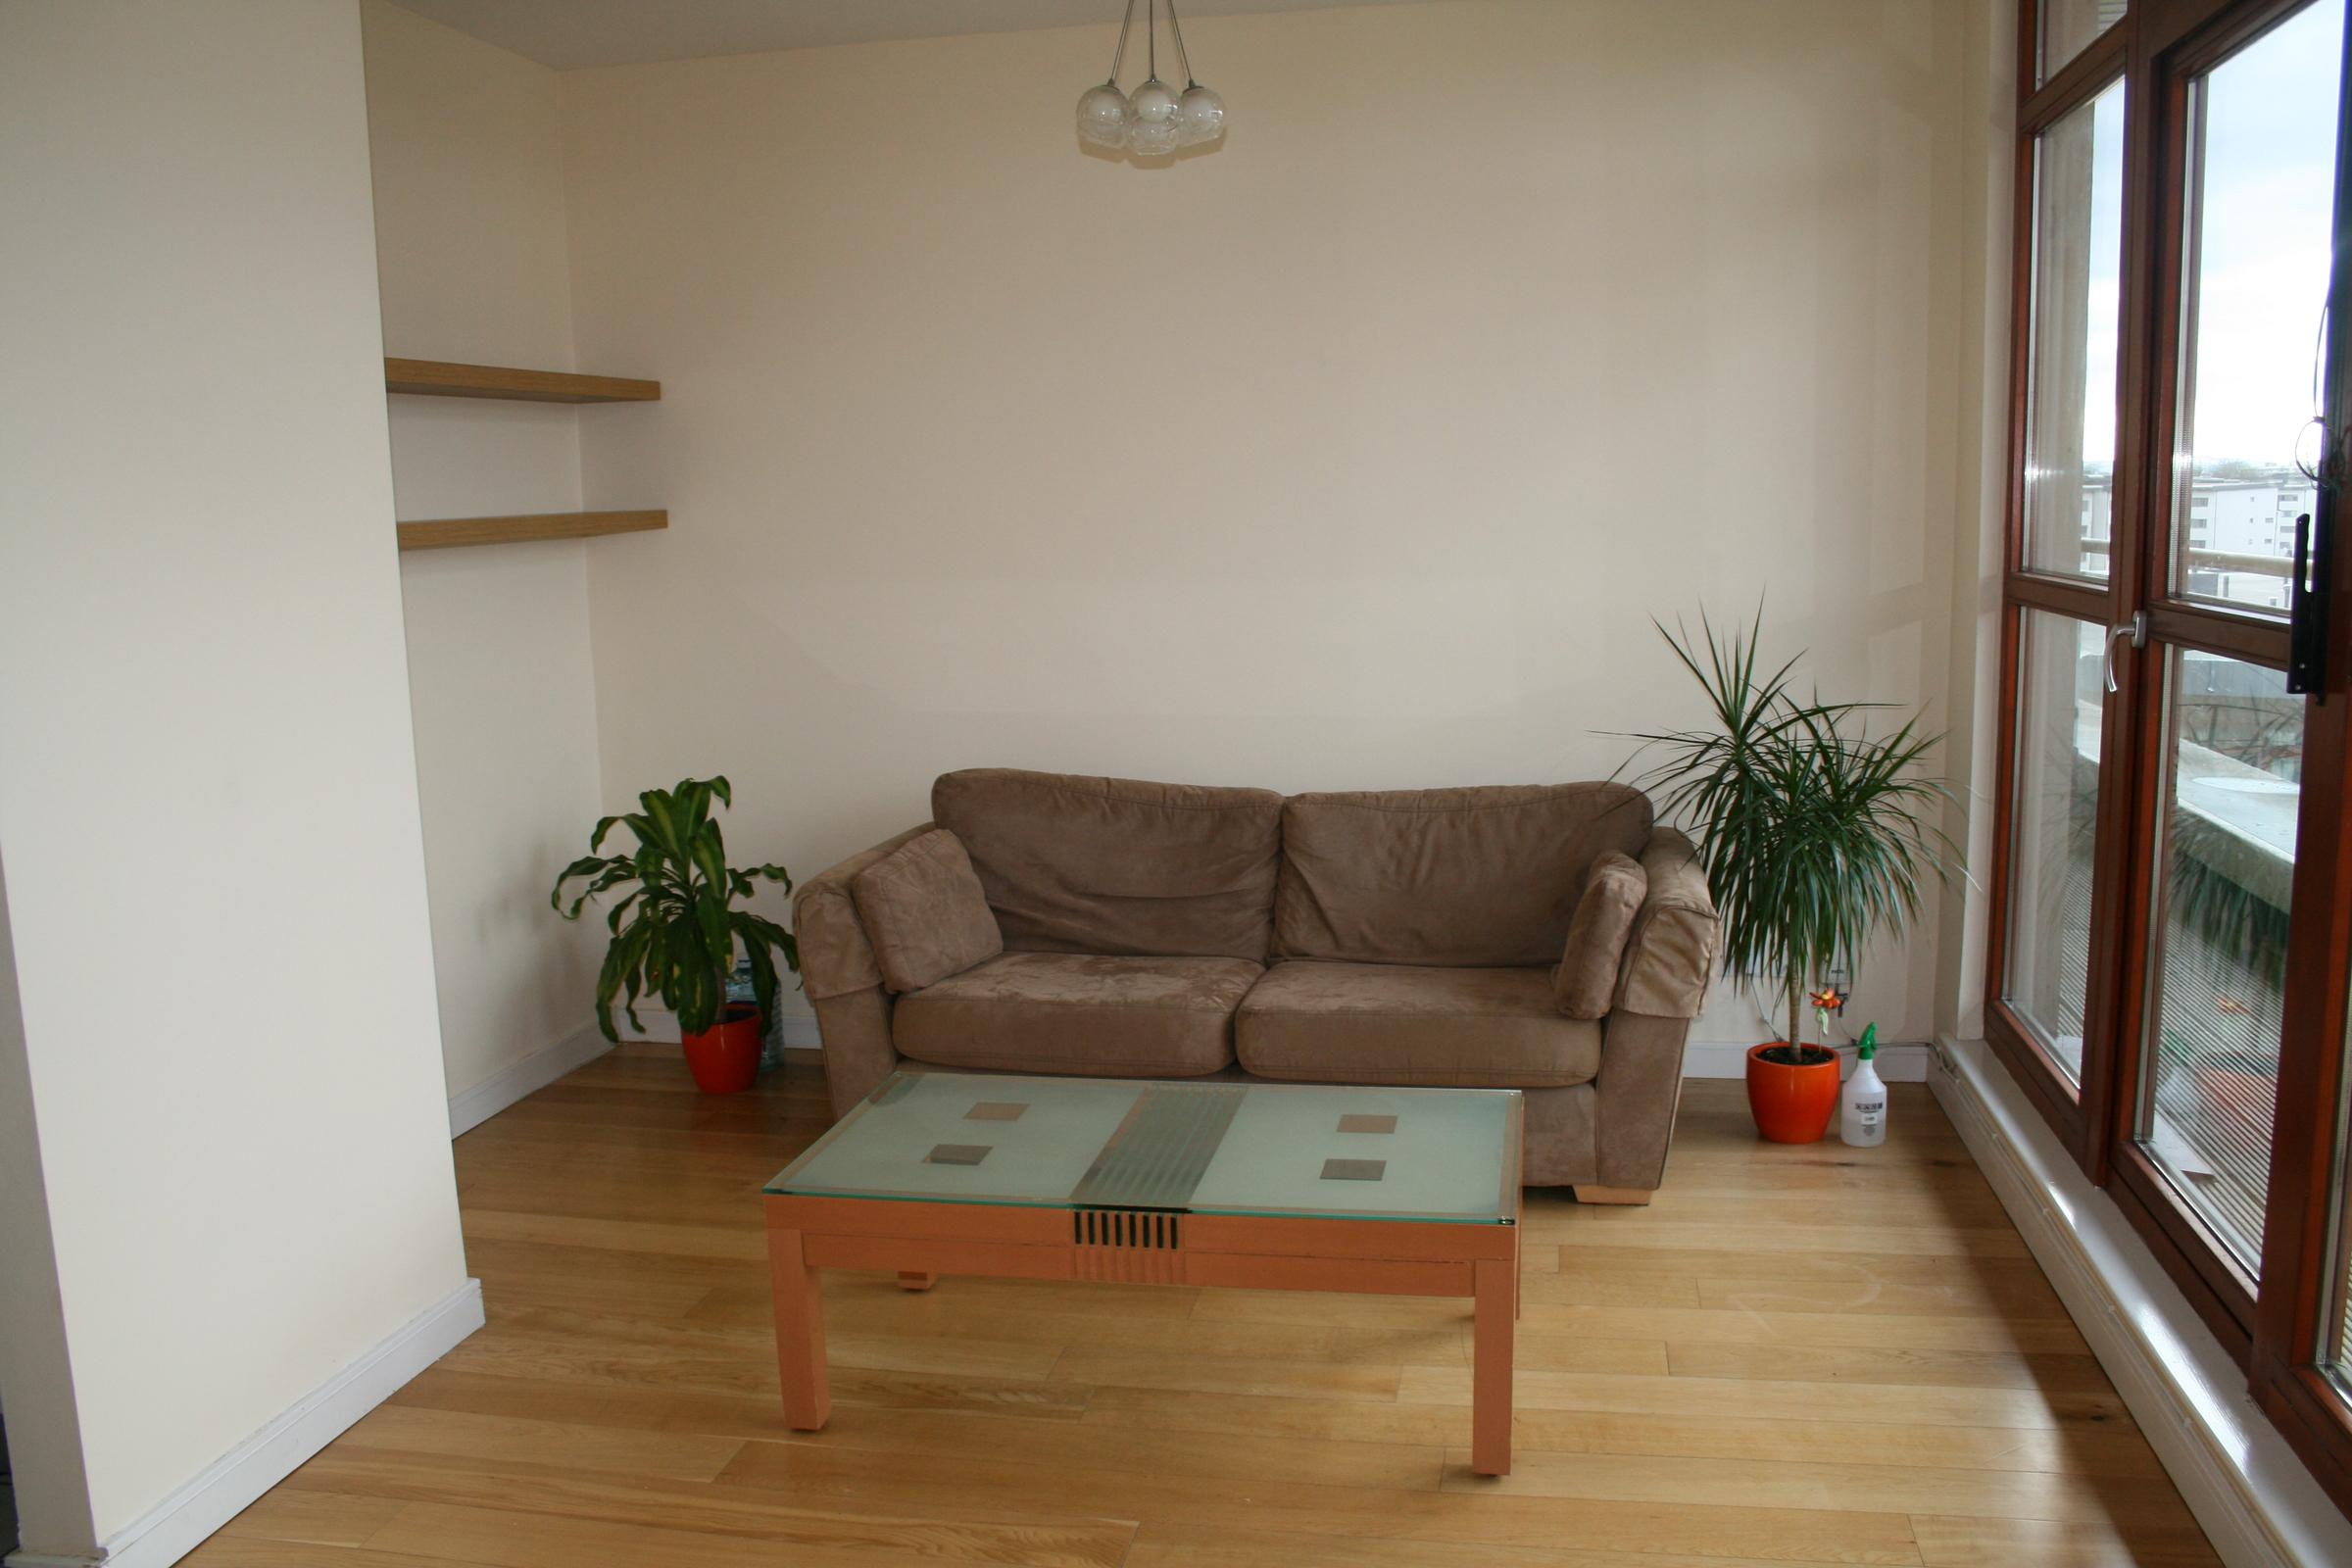 Apartment 61, Block 3, Parklands, Northwood, Santry, Dublin 9